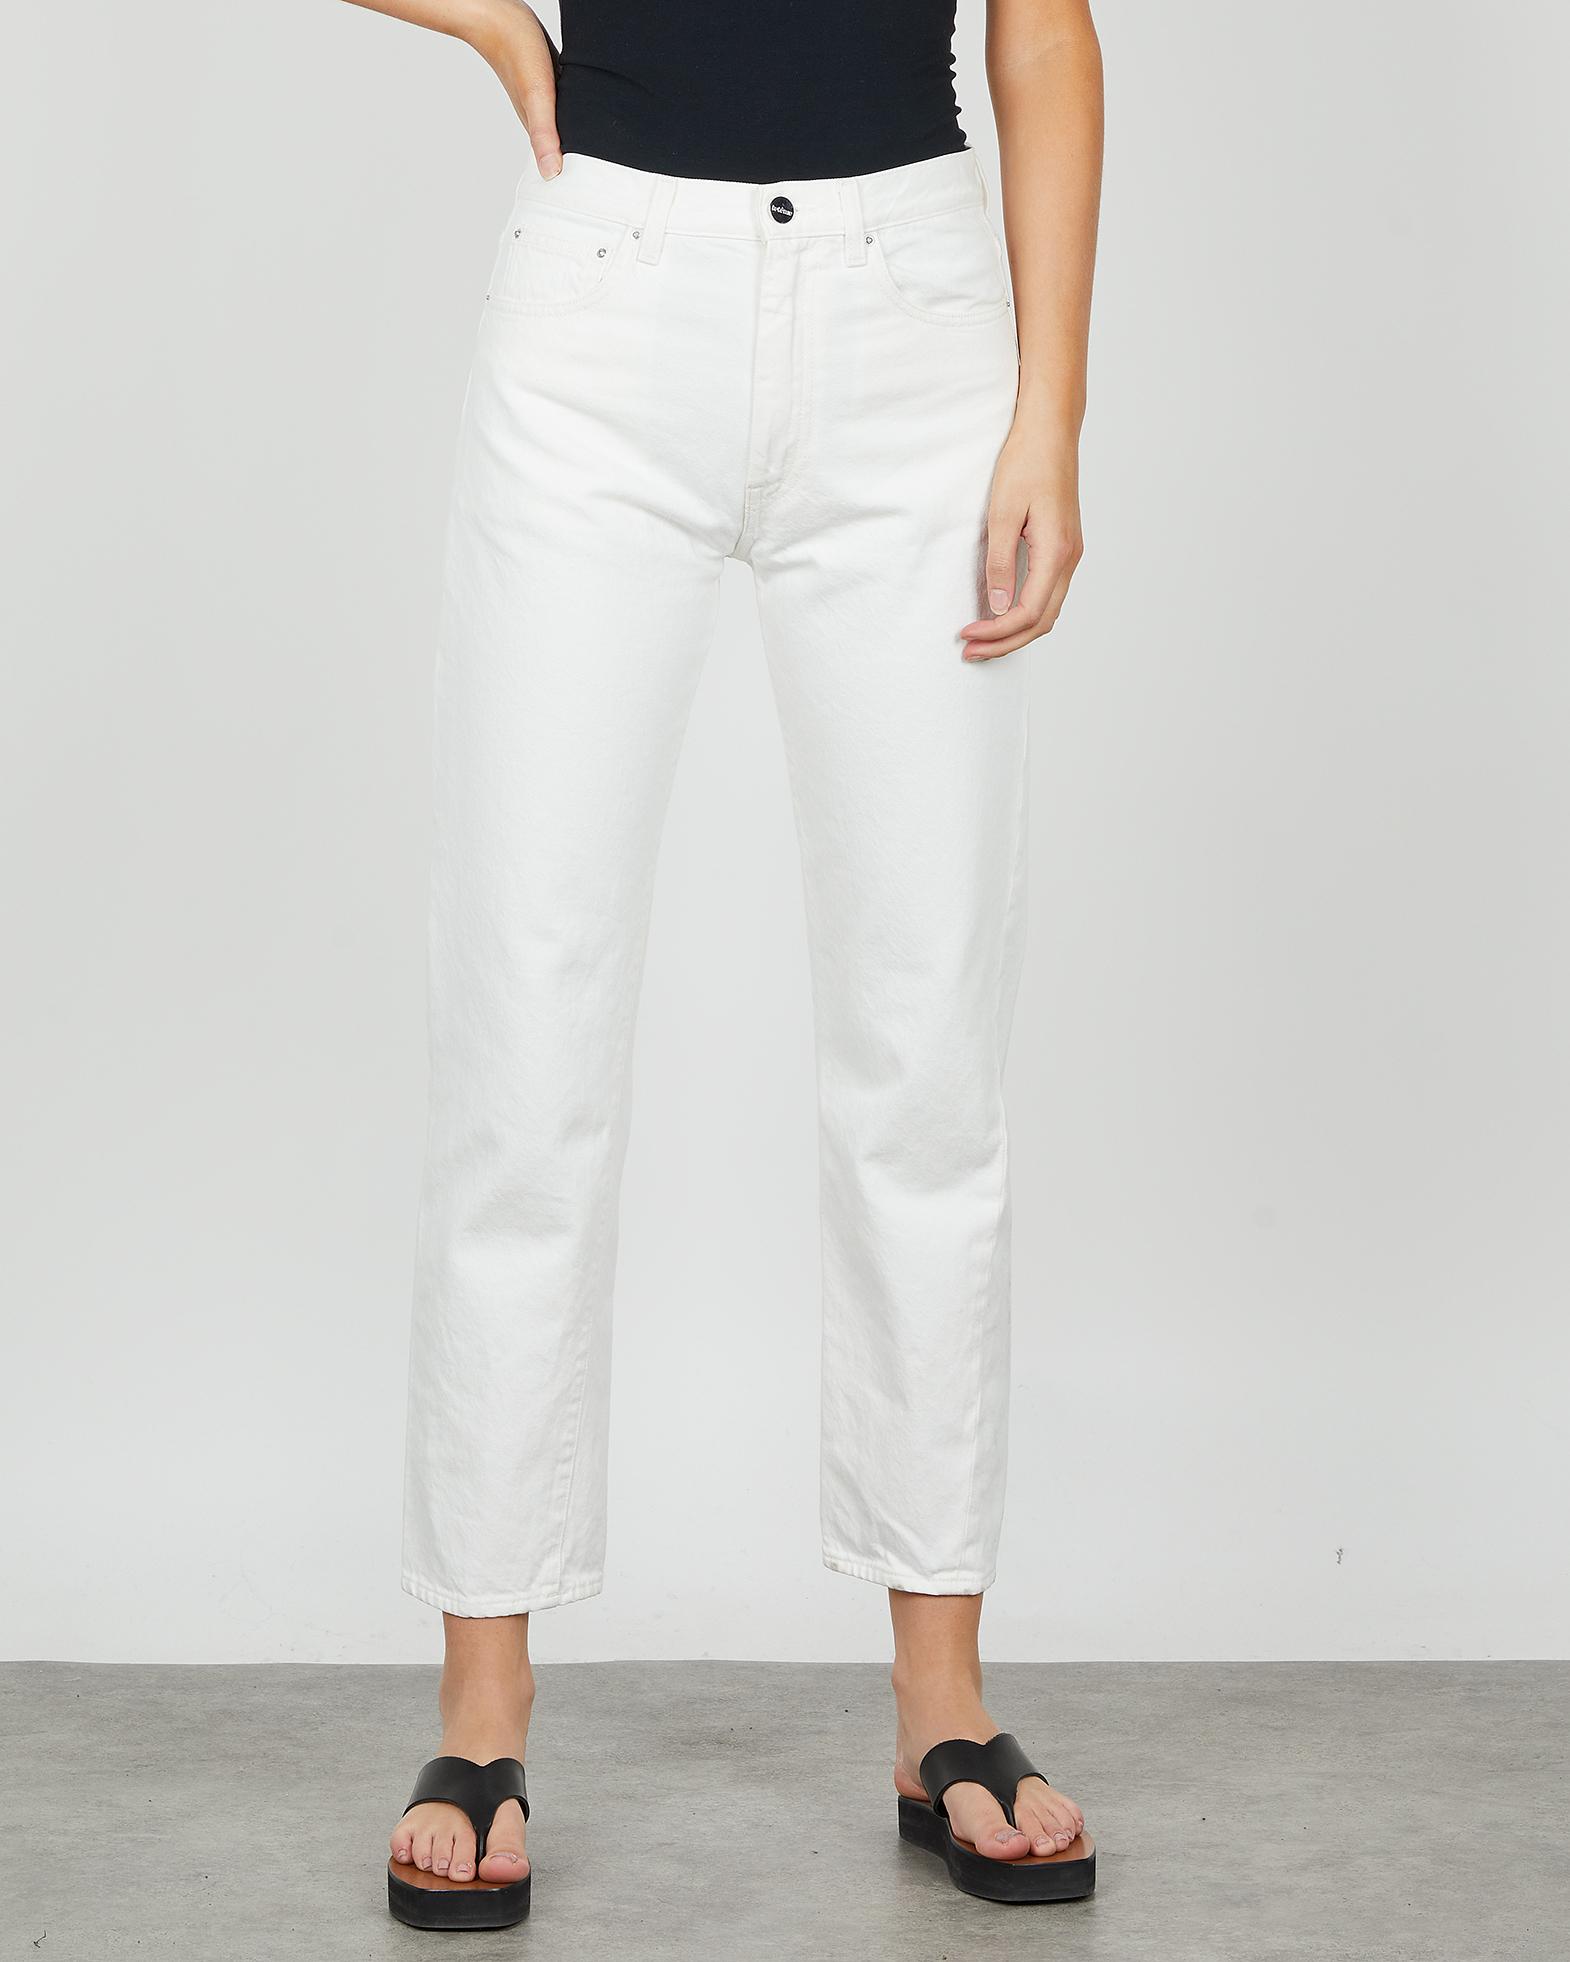 Totême Jeans Twisted Seam vit 23/32